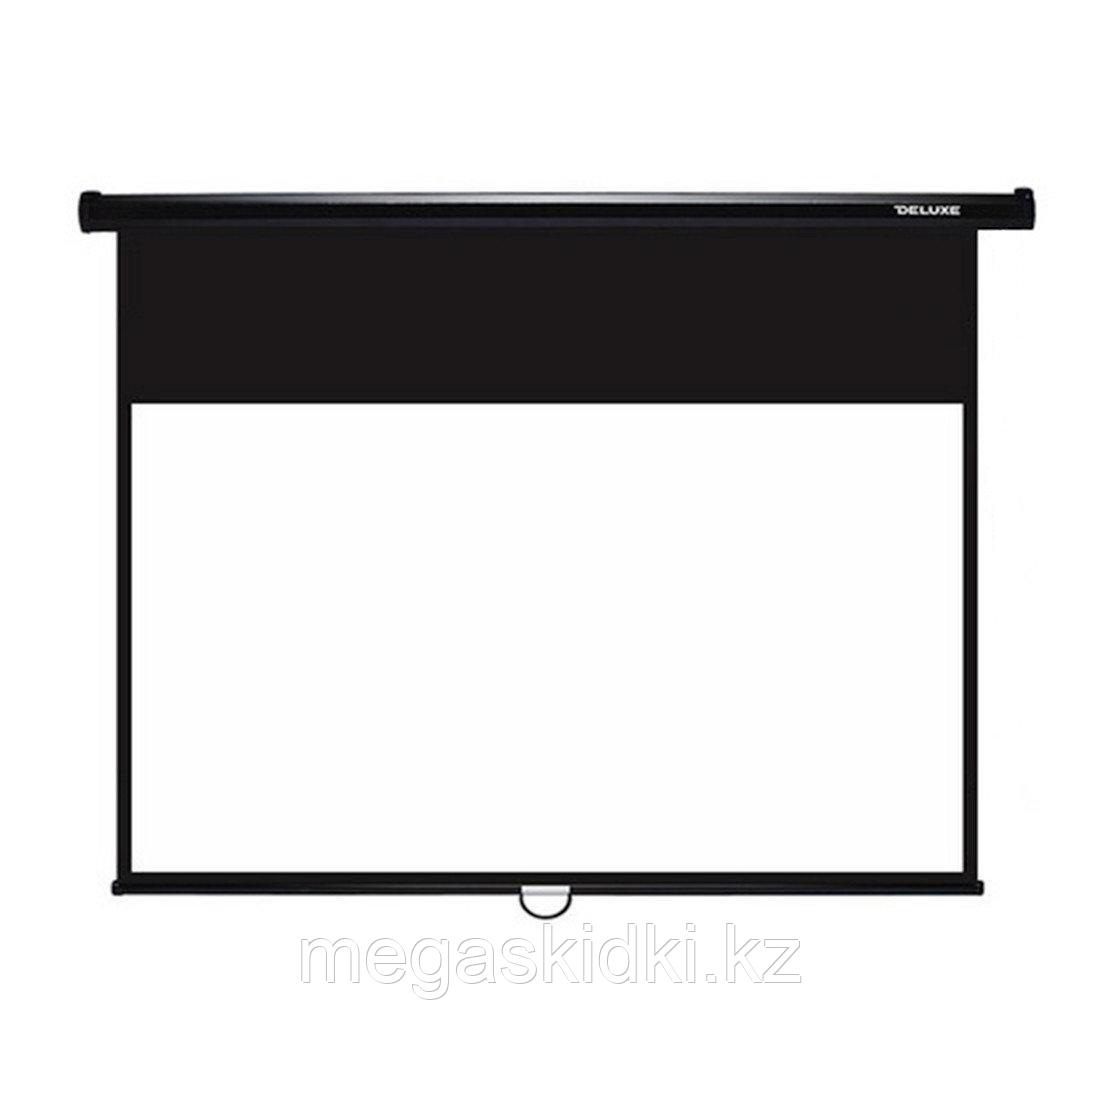 Экран для проектора Deluxe DLS-M274-210